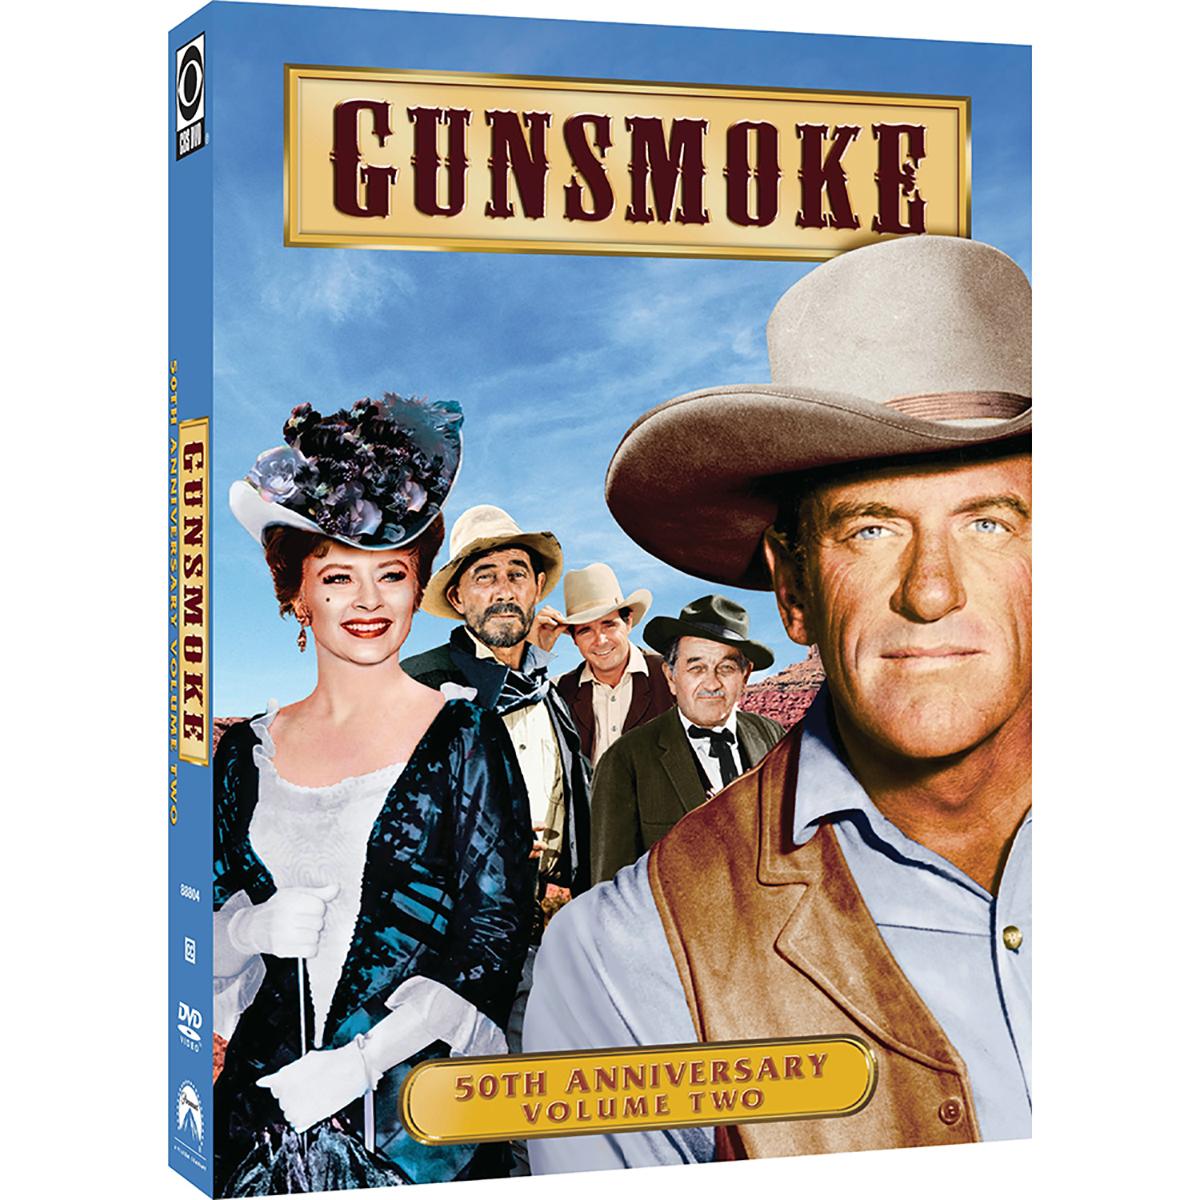 Gunsmoke: 50th Anniversary - Volume 2 DVD -  DVDs & Videos 6445-319877